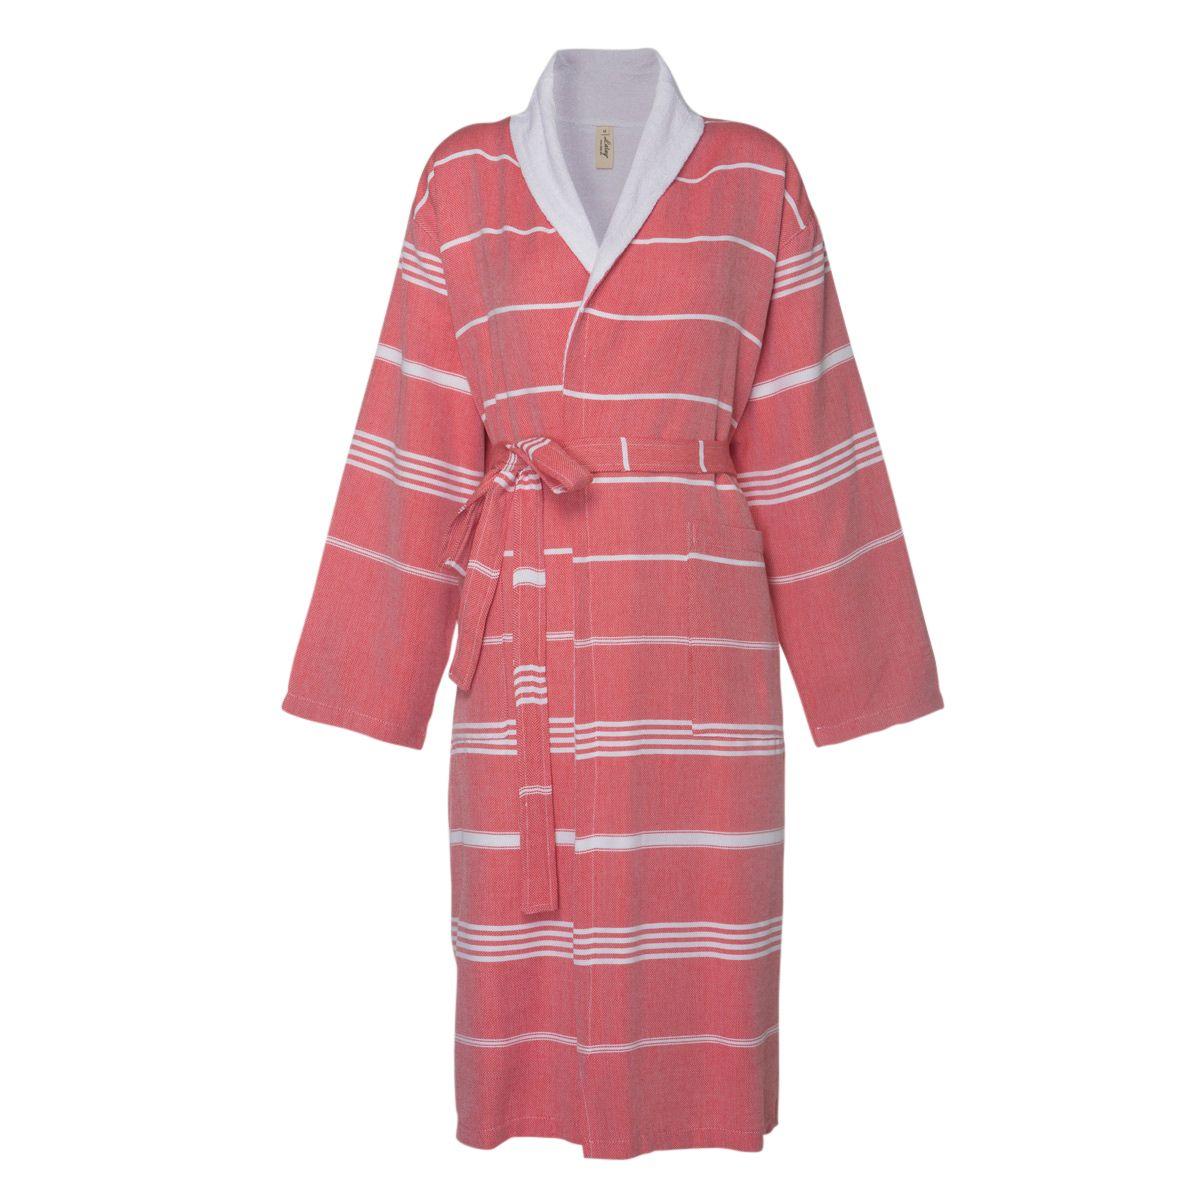 Bathrobe Leyla / With Towel Lining - Red